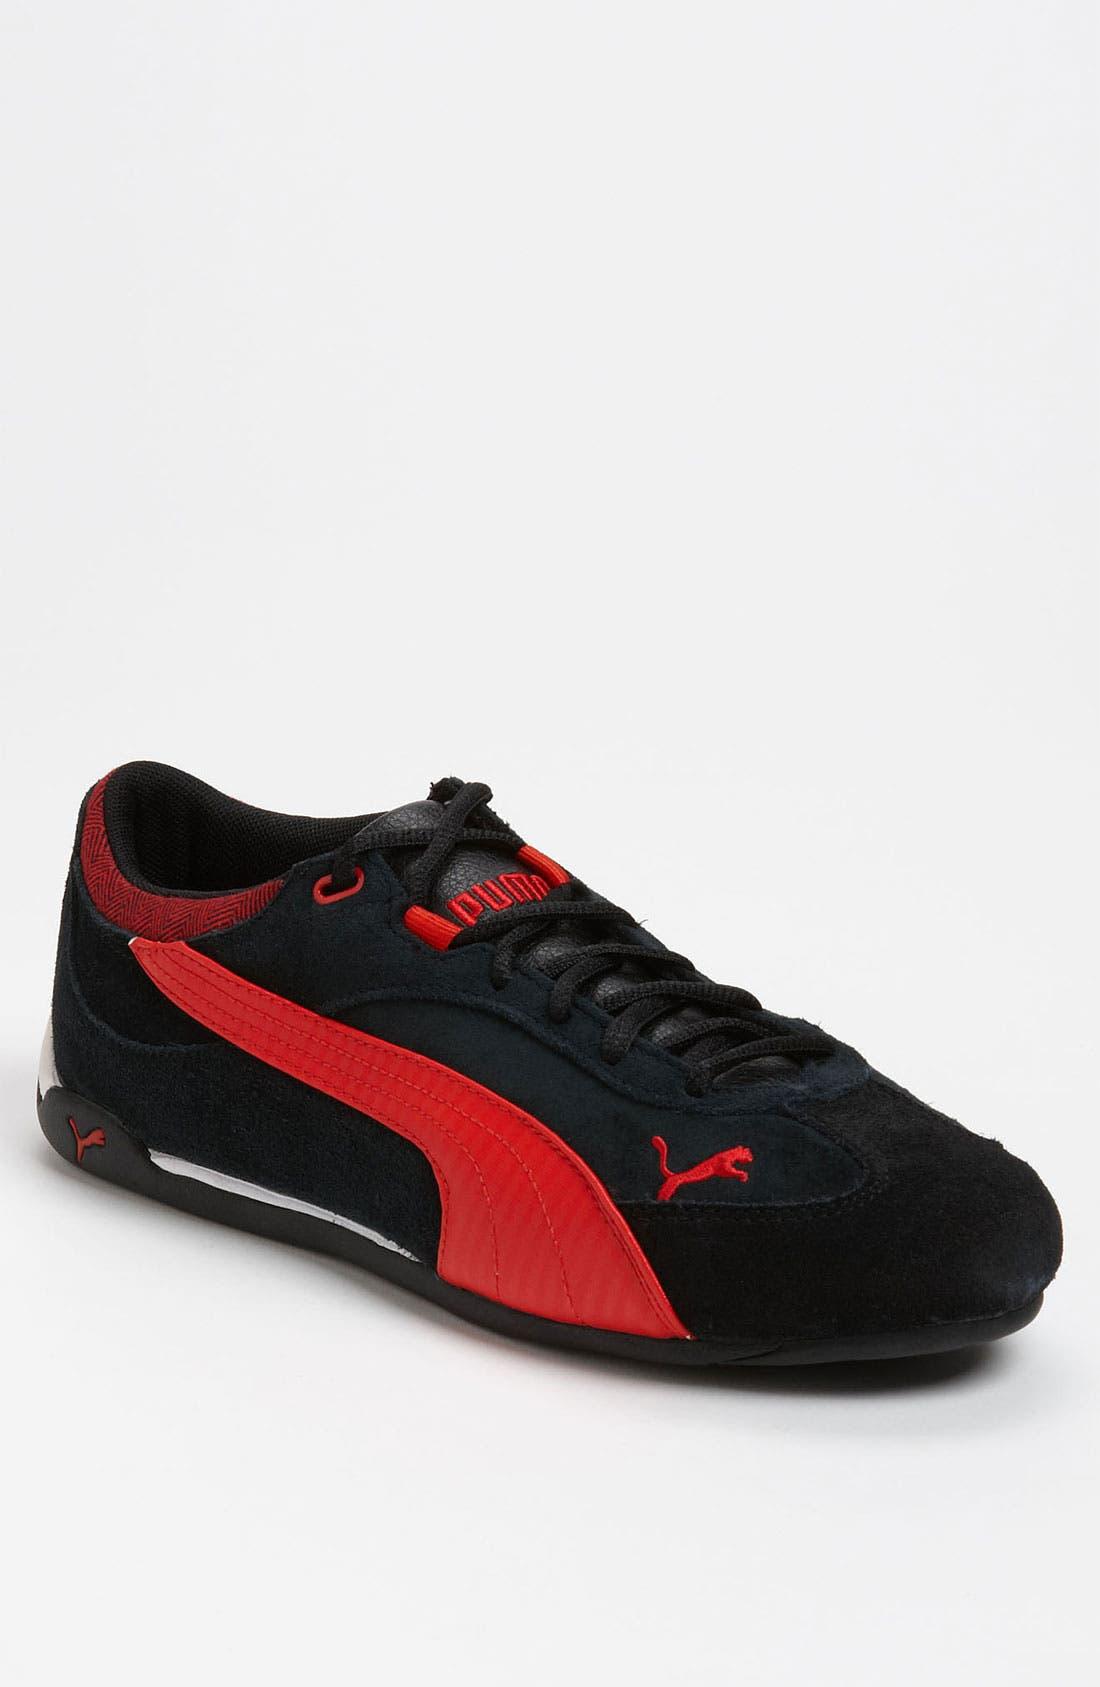 Main Image - PUMA 'Fast Cat' Sneaker (Men)